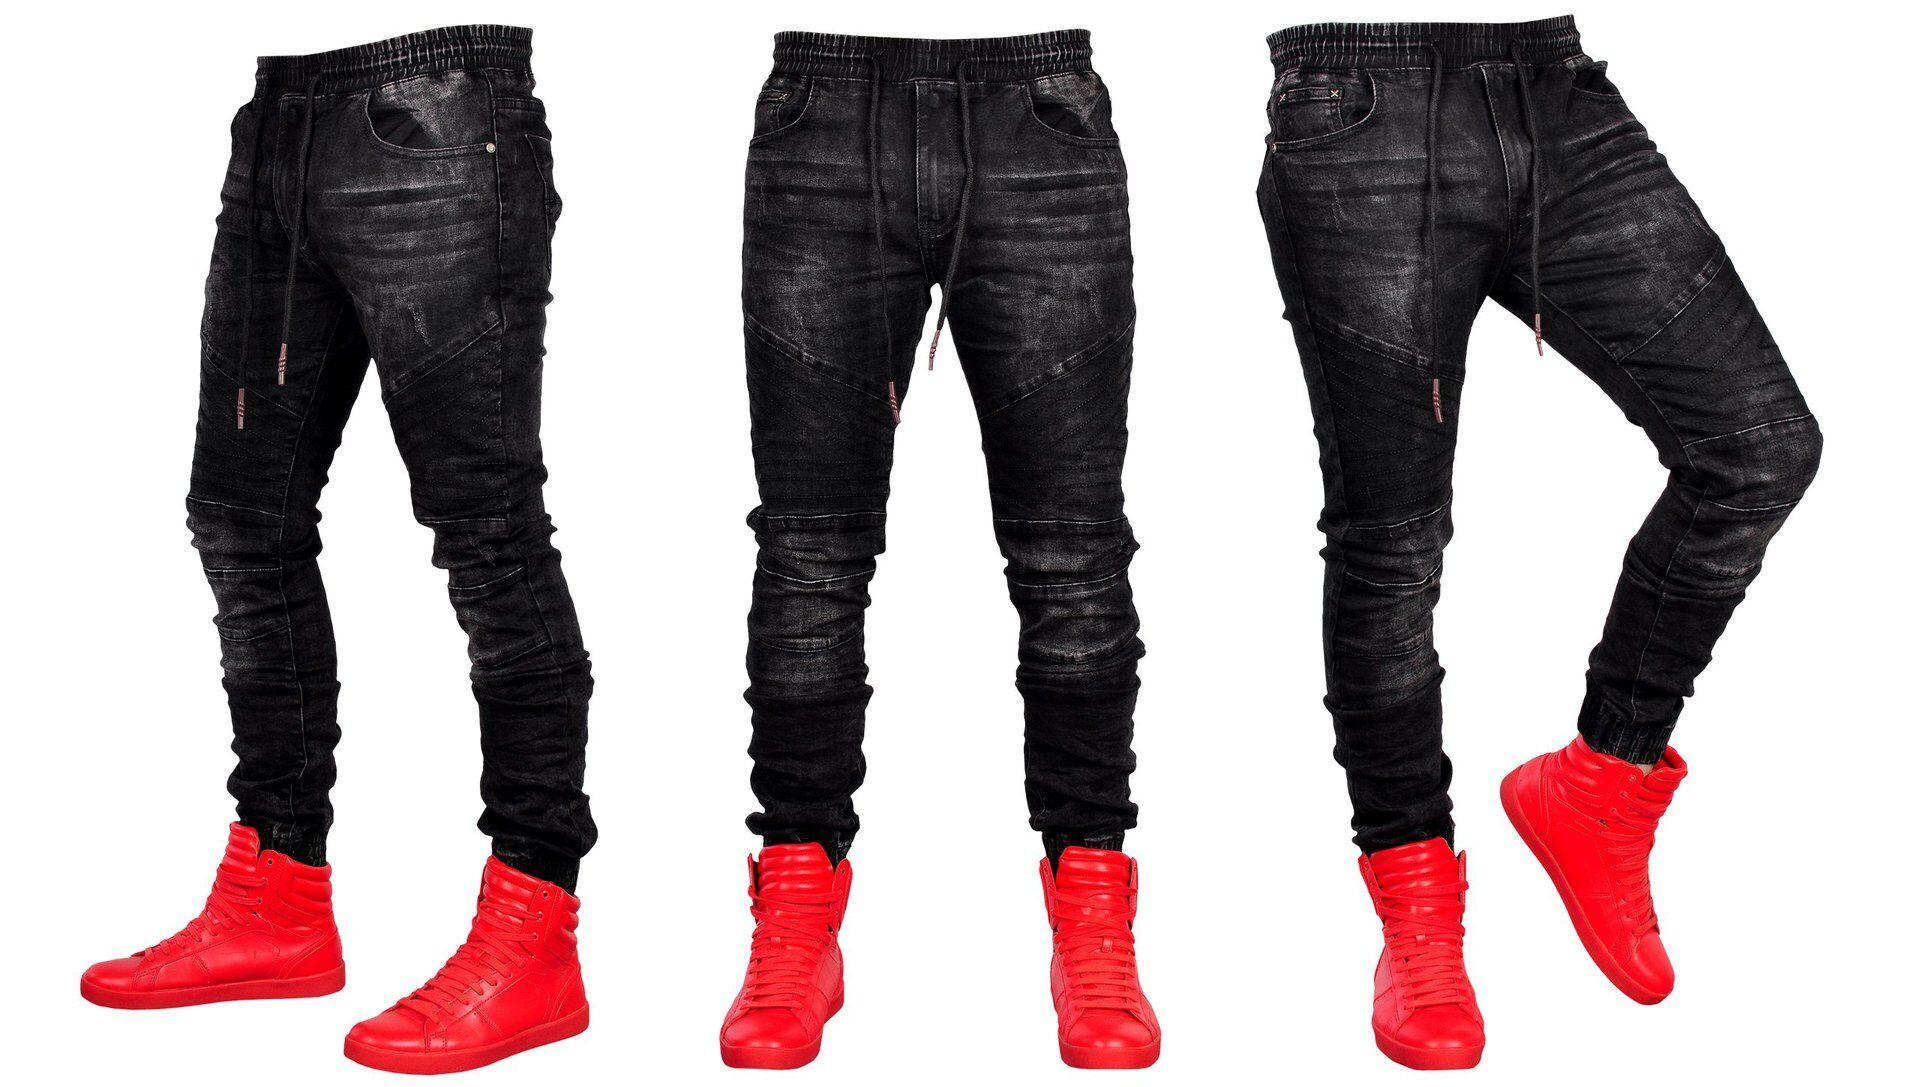 63a2afbe3a5efb 2019 Motorrad Biker Männer Slim Fit Zerrissene Jeans Herren Distressed Denim  Skinny Washed Vintage Zipper Jeans S 3XL Von Boy_top2028, $27.42 Auf  De.Dhgate.